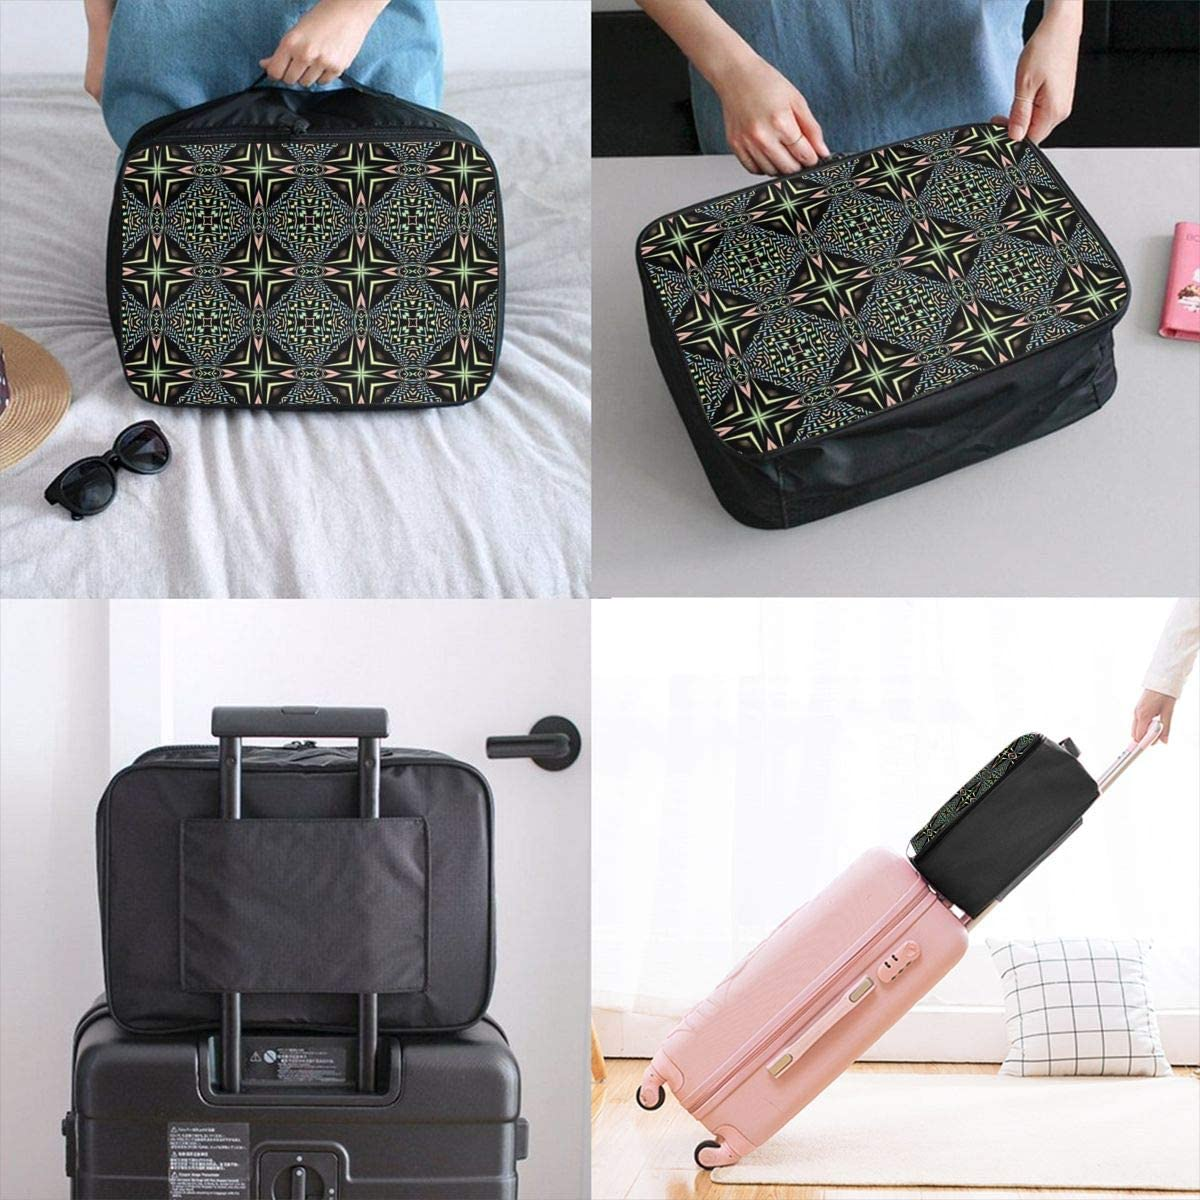 Yunshm Kaleidoscope Pattern Seamless Design Geometric Customized Trolley Handbag Waterproof Unisex Large Capacity For Business Travel Storage